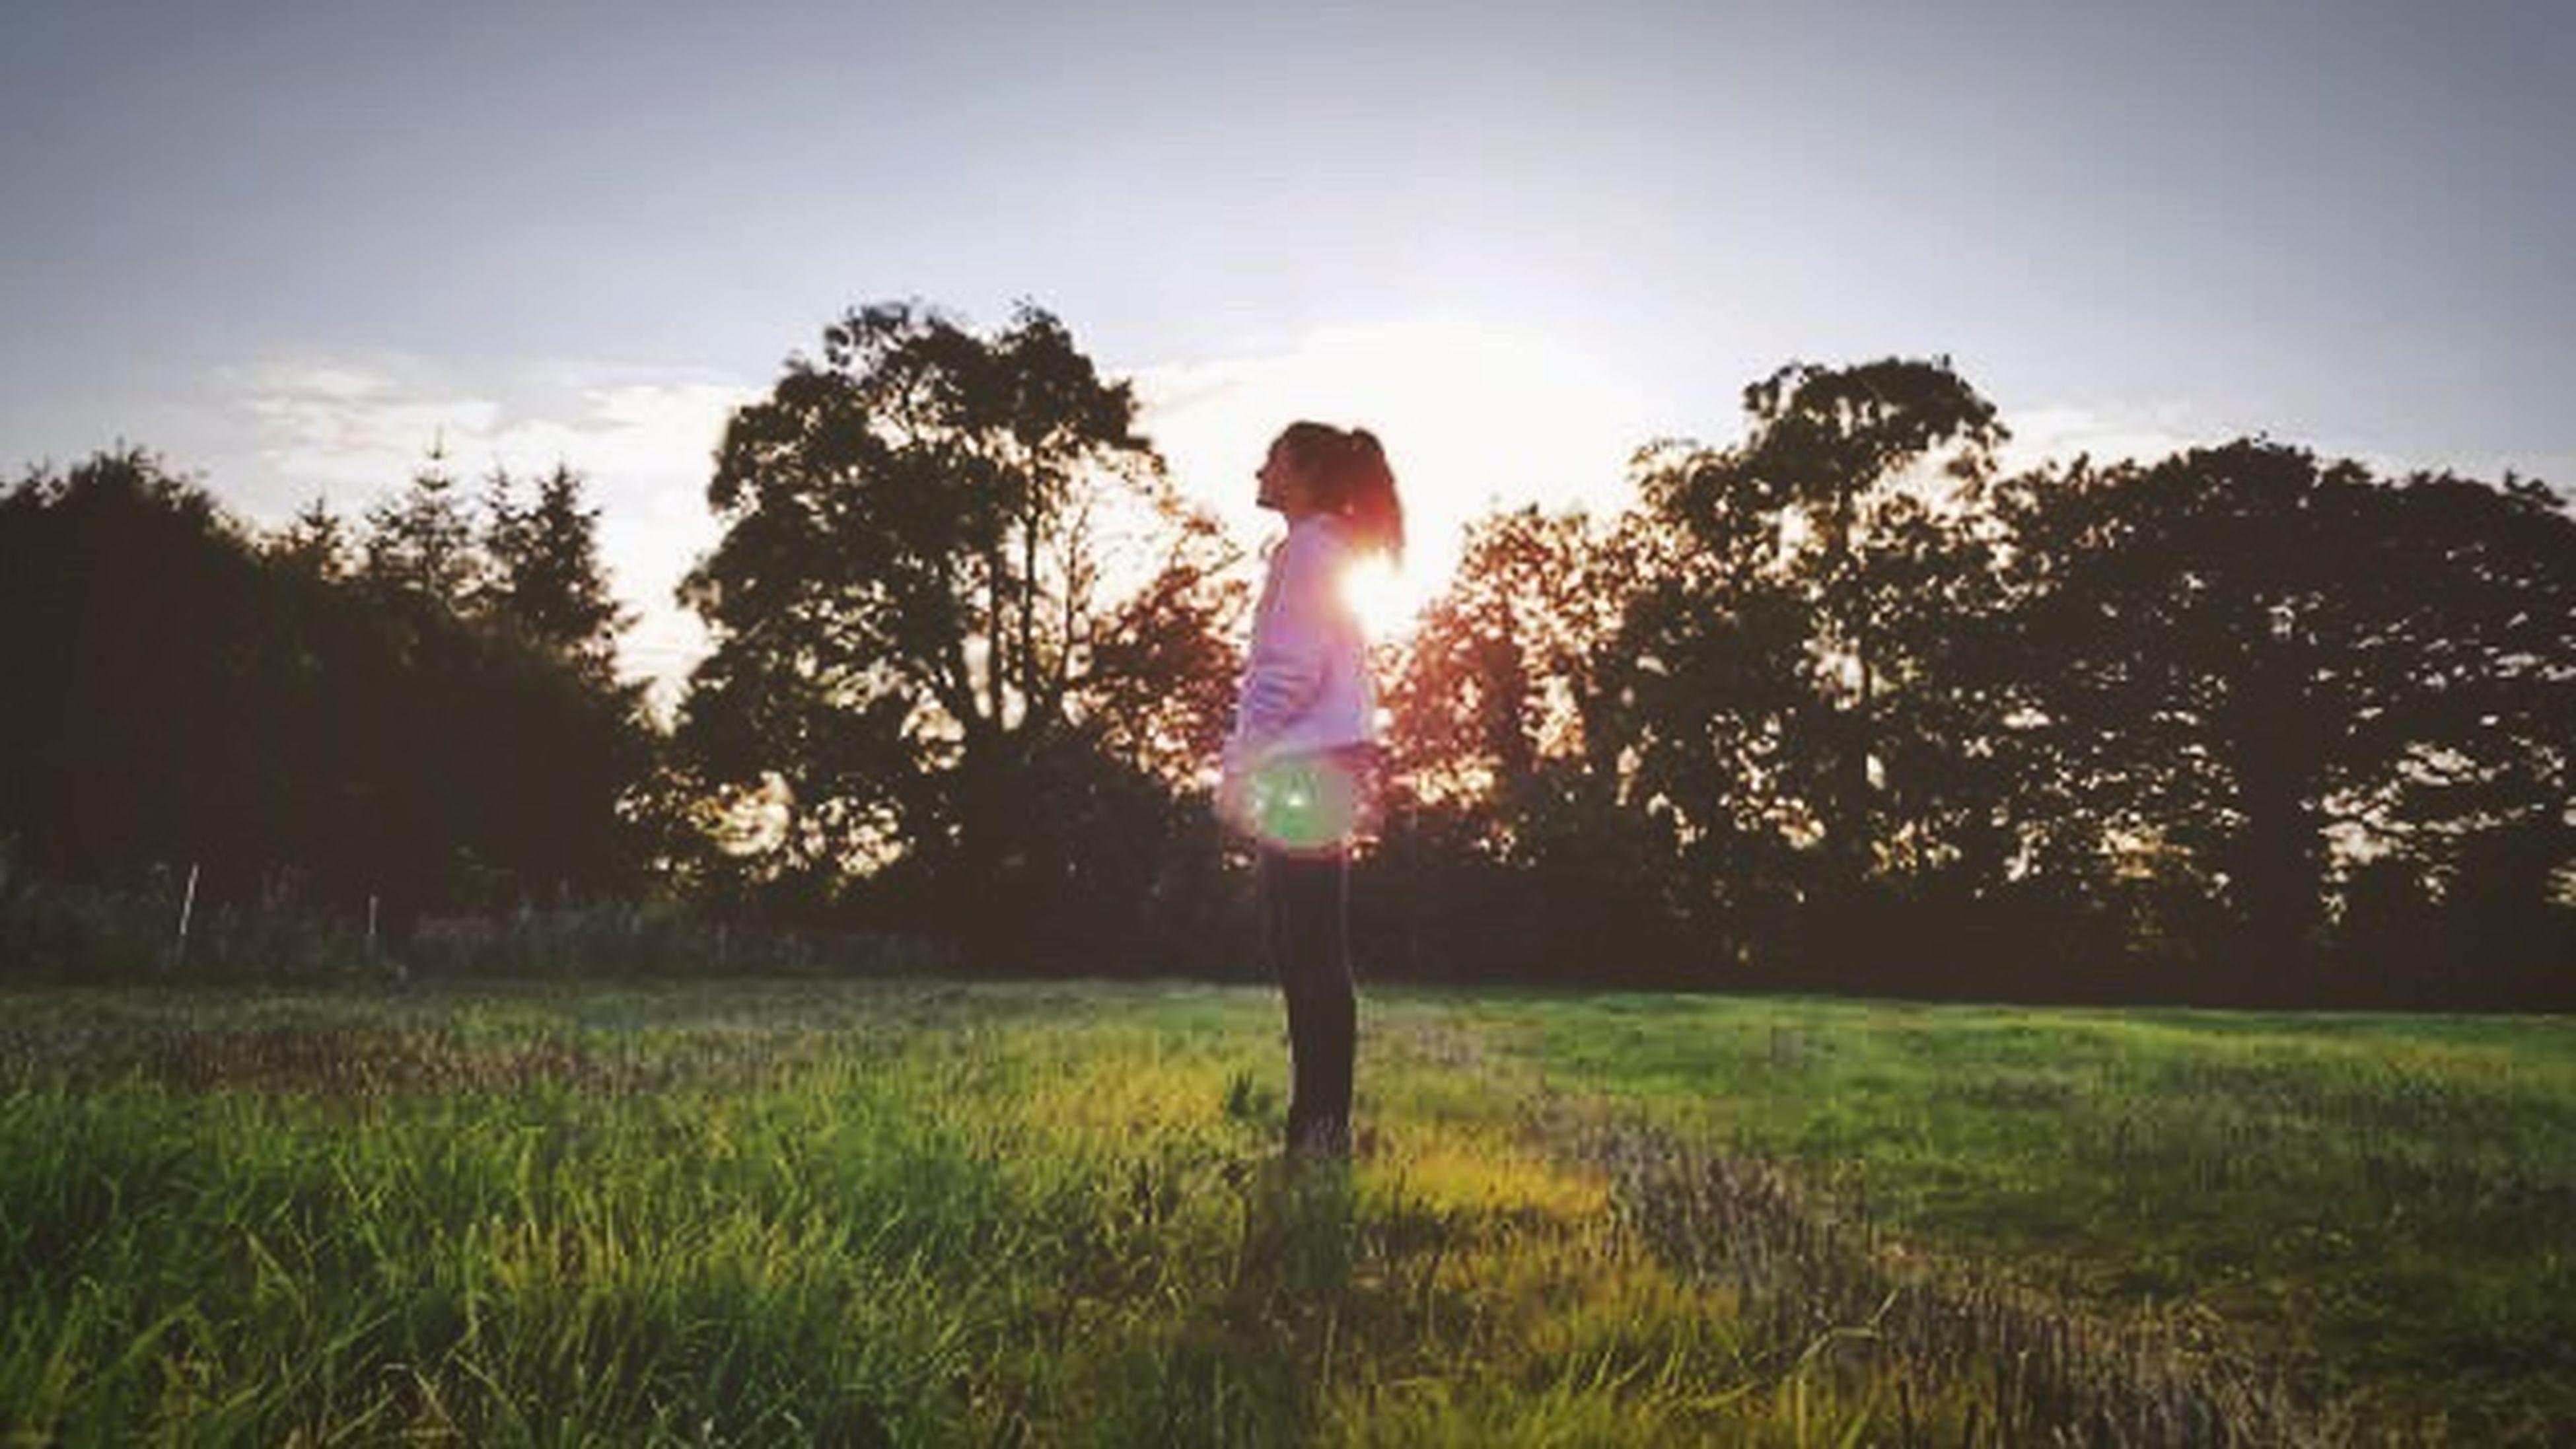 tree, grass, landscape, field, grassy, tranquil scene, tranquility, lifestyles, sunlight, growth, leisure activity, nature, green color, beauty in nature, scenics, non-urban scene, lens flare, sun, sunbeam, day, sky, solitude, rural scene, grass area, remote, bright